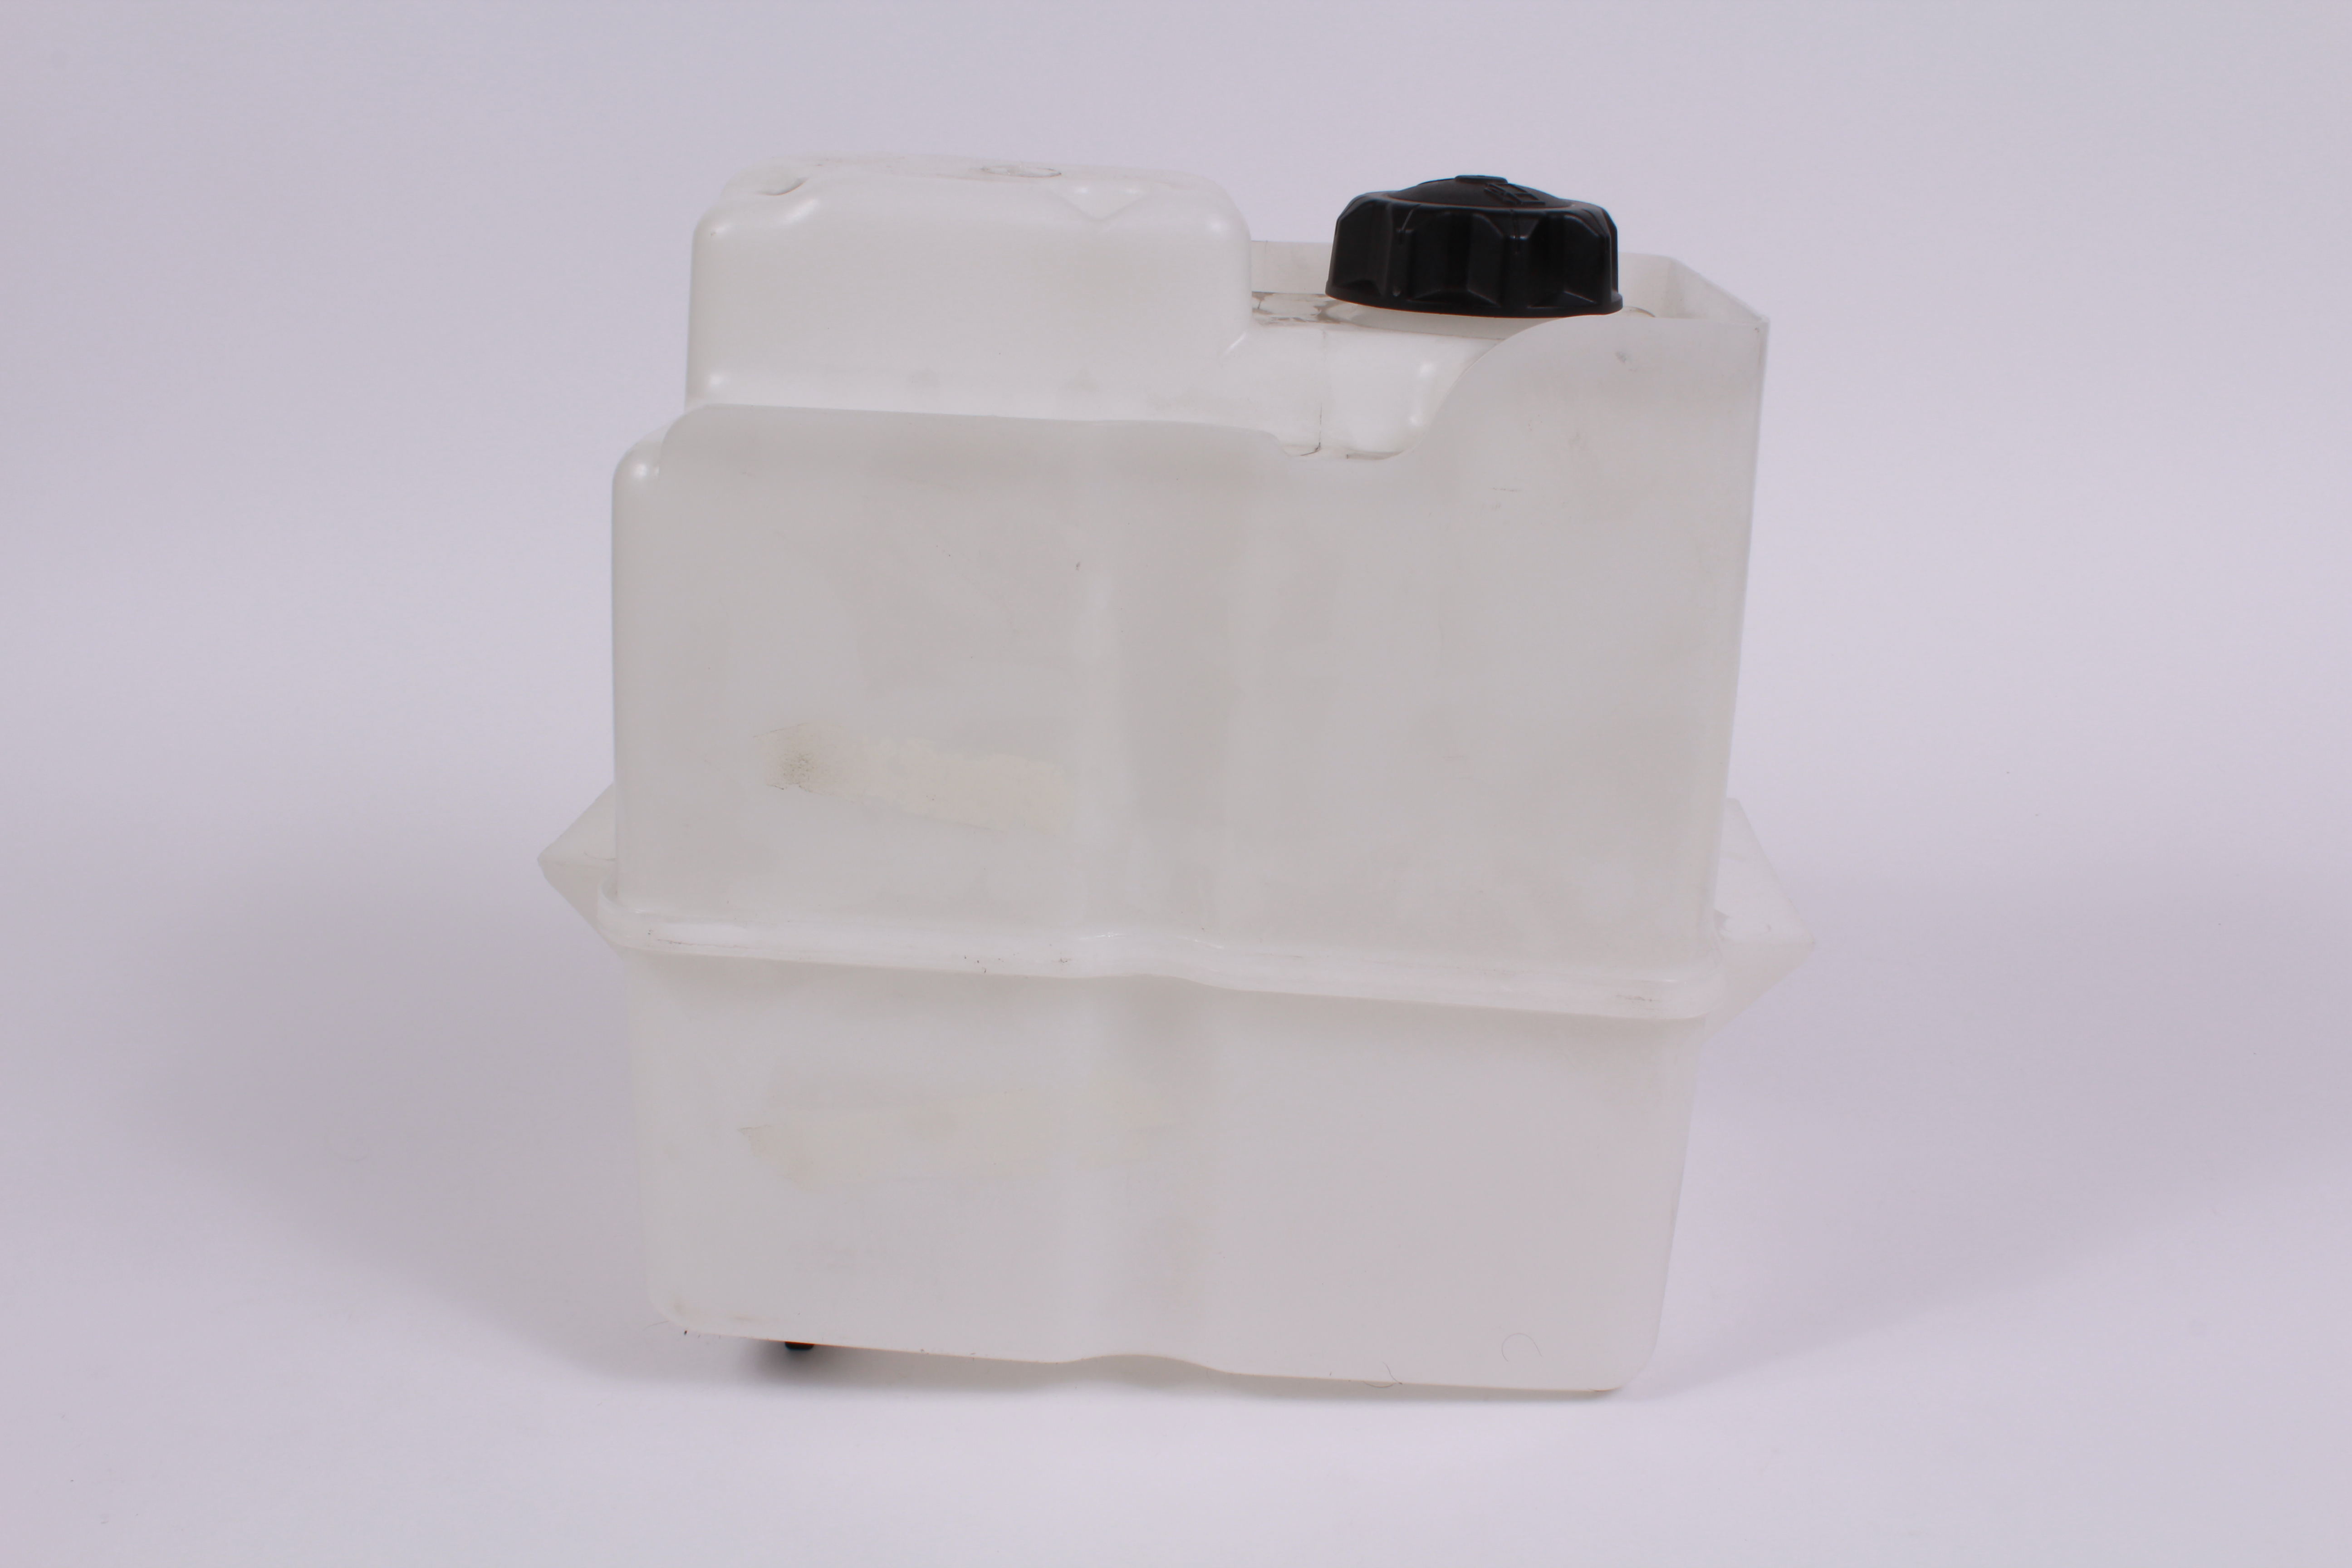 2.5 Gallon White Plastic Gas Tank replacement Husqvarna Part # 407489